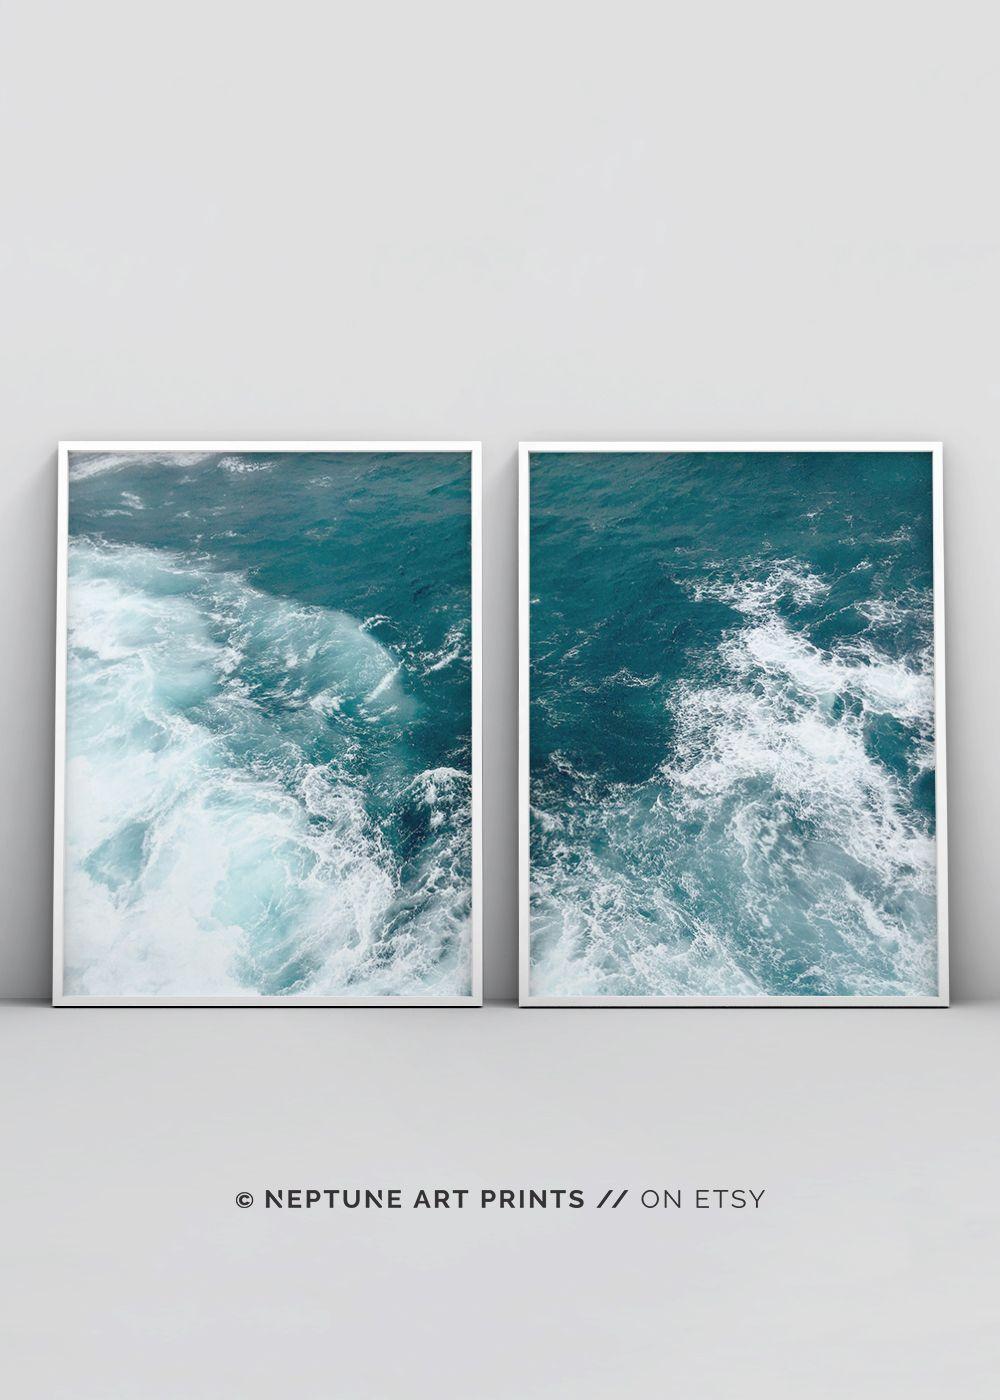 Photo of Coastal Wall Art, Coastal Decor, Vaskerom Decor, Digital nedlasting, Utskriftsvennlig plakat, Beach Decor, Ocean Print, Nautical Wall Art, Modern